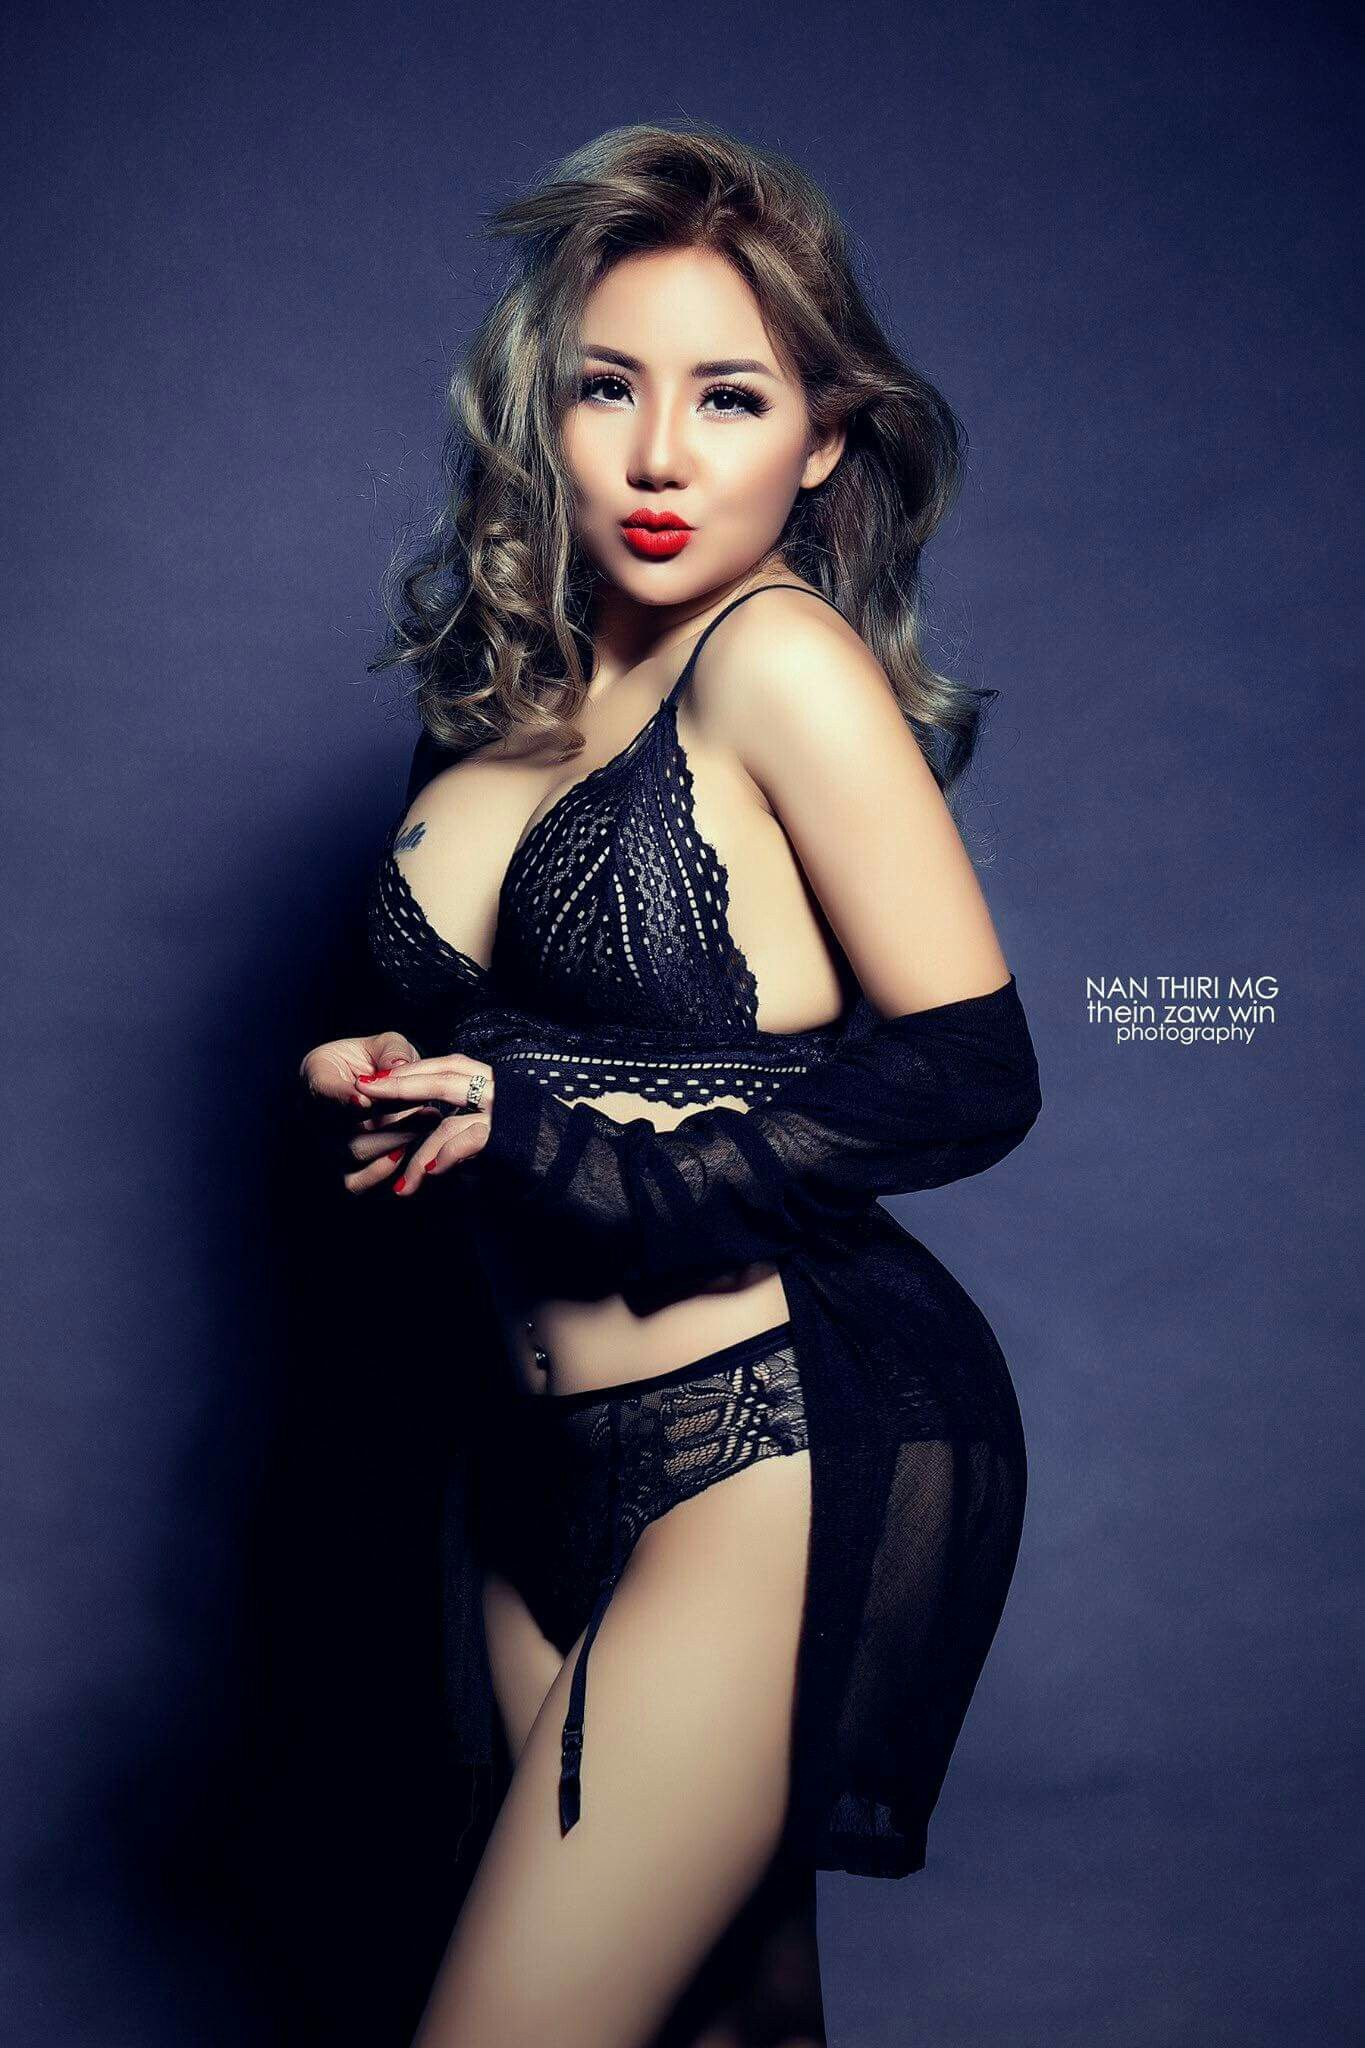 Nan Thiri Mg Super Hot Photos